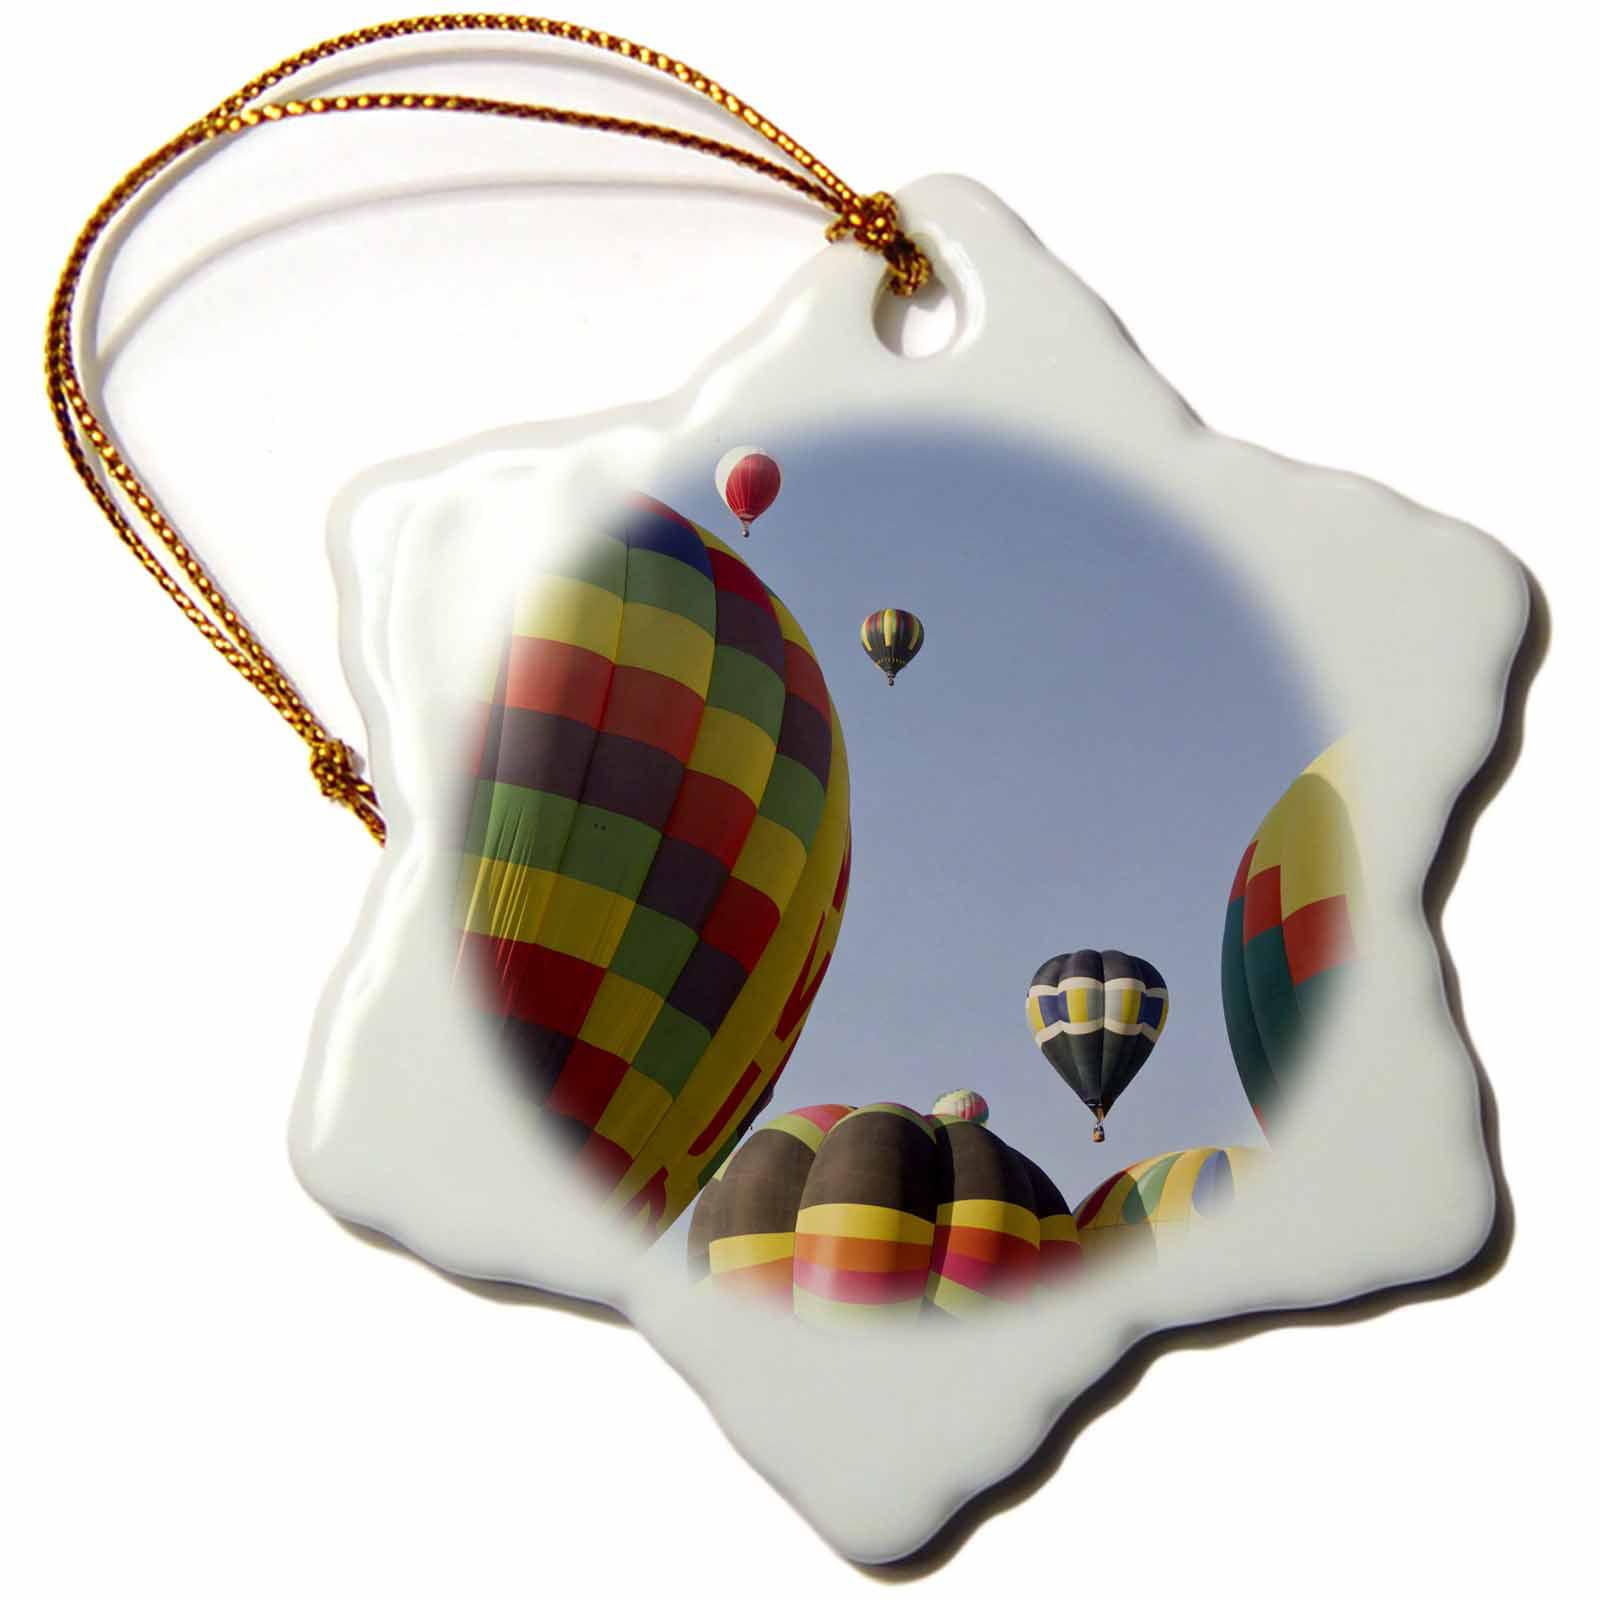 Supplier Generic 3d Rose Albuquerque Hot Air Balloon, New Mexico, Usa  -  Us 32 Wsu 0019  -  William Sutton, Snowflake Ornament, Porcelain, 3 - inch